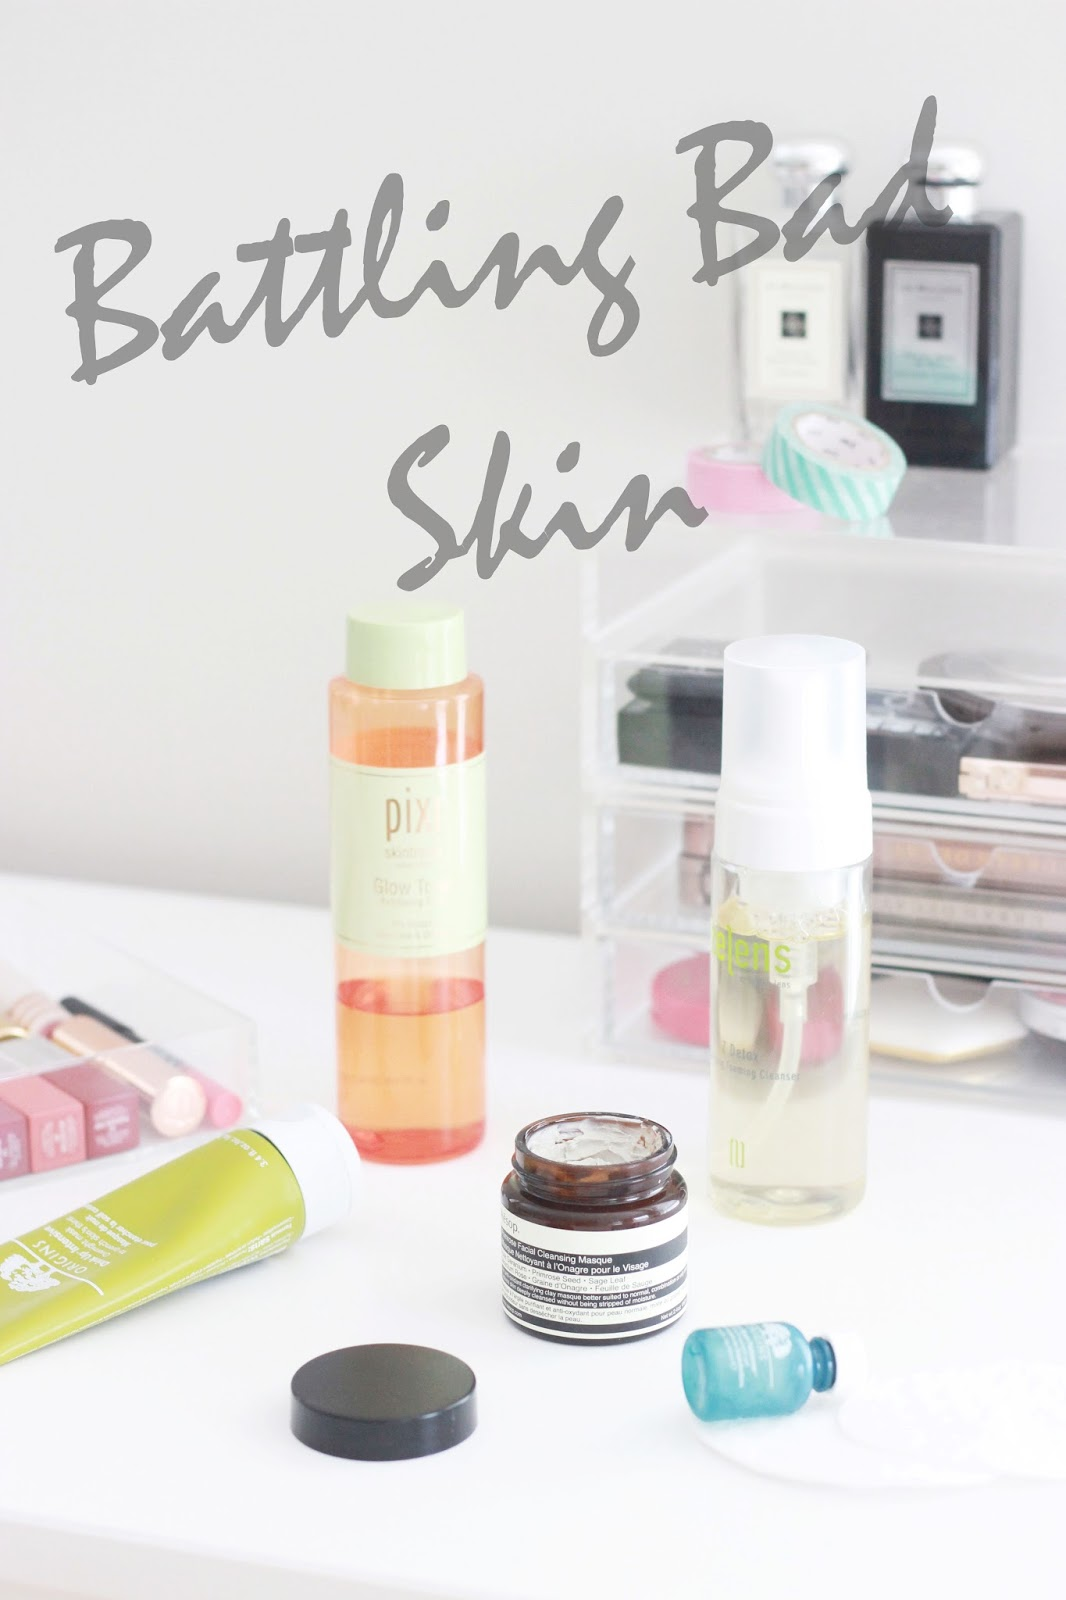 Battling Bad Skin